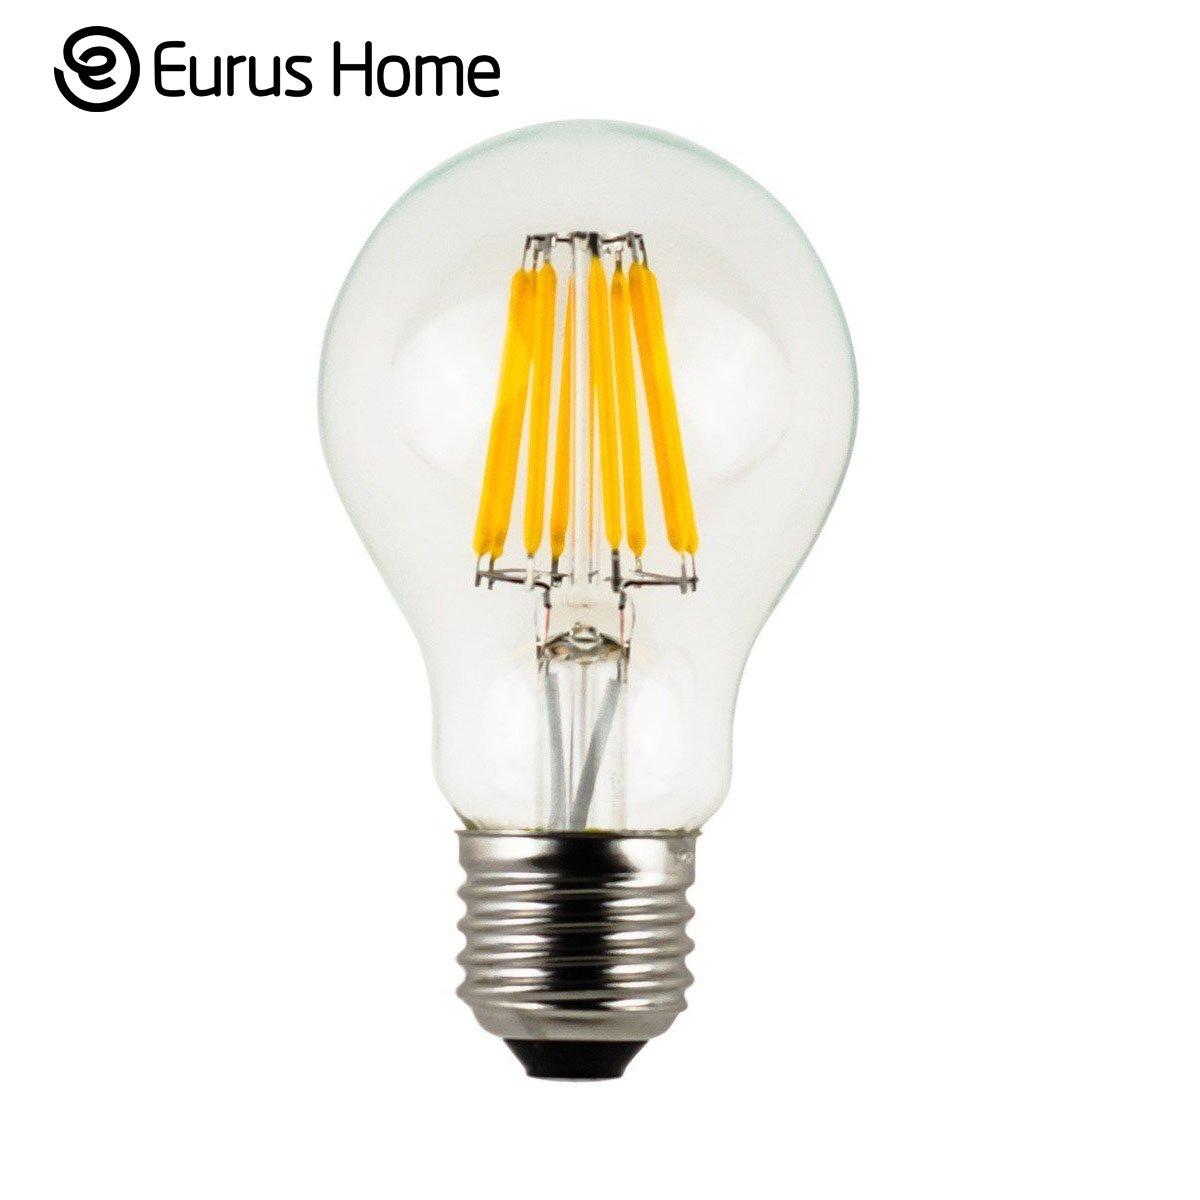 Vintage edison bulb old fashioned lamp classic a60 led 2w or 4w - Eurus Home Vintage Led Filament Bulb A19 8w Led Light Bulb Medium Screw E26 Base Clear Soft White 2700k Led Edison Bulb 75w Equivalent 120vac